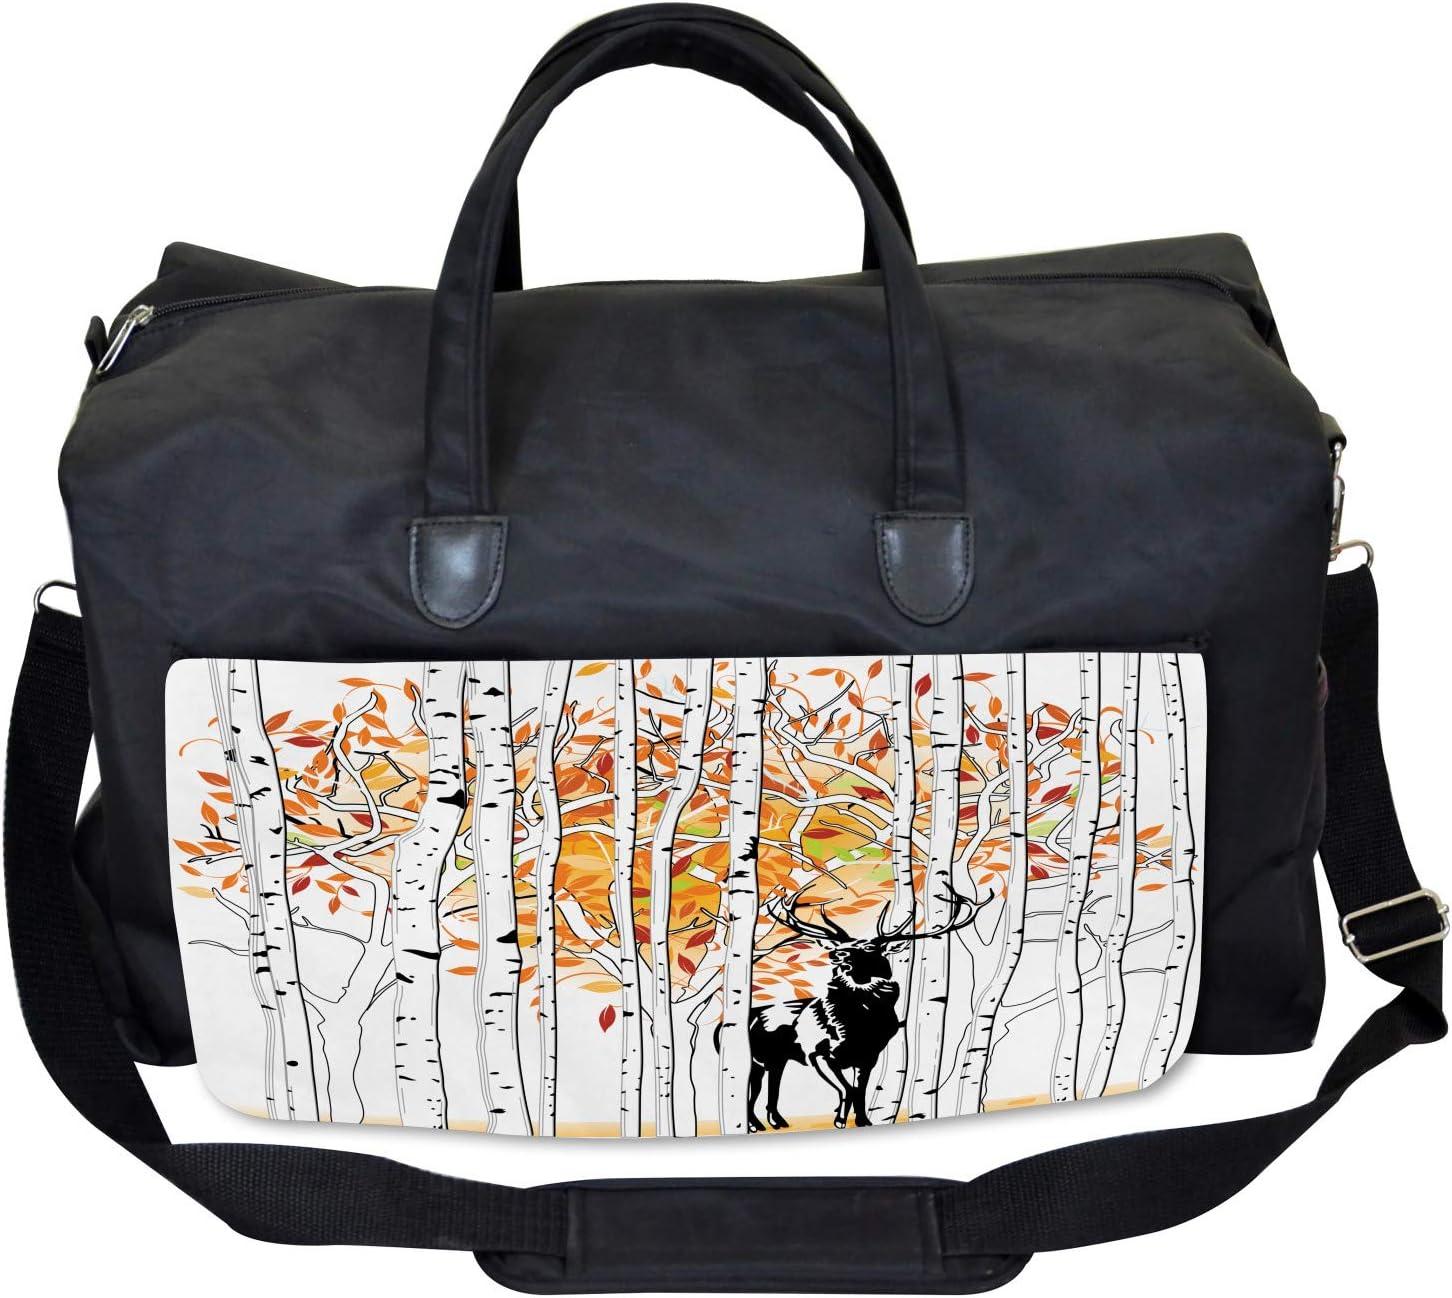 Ambesonne Deer Gym Bag Large Weekender Carry-on Trees Foliage Wilderness